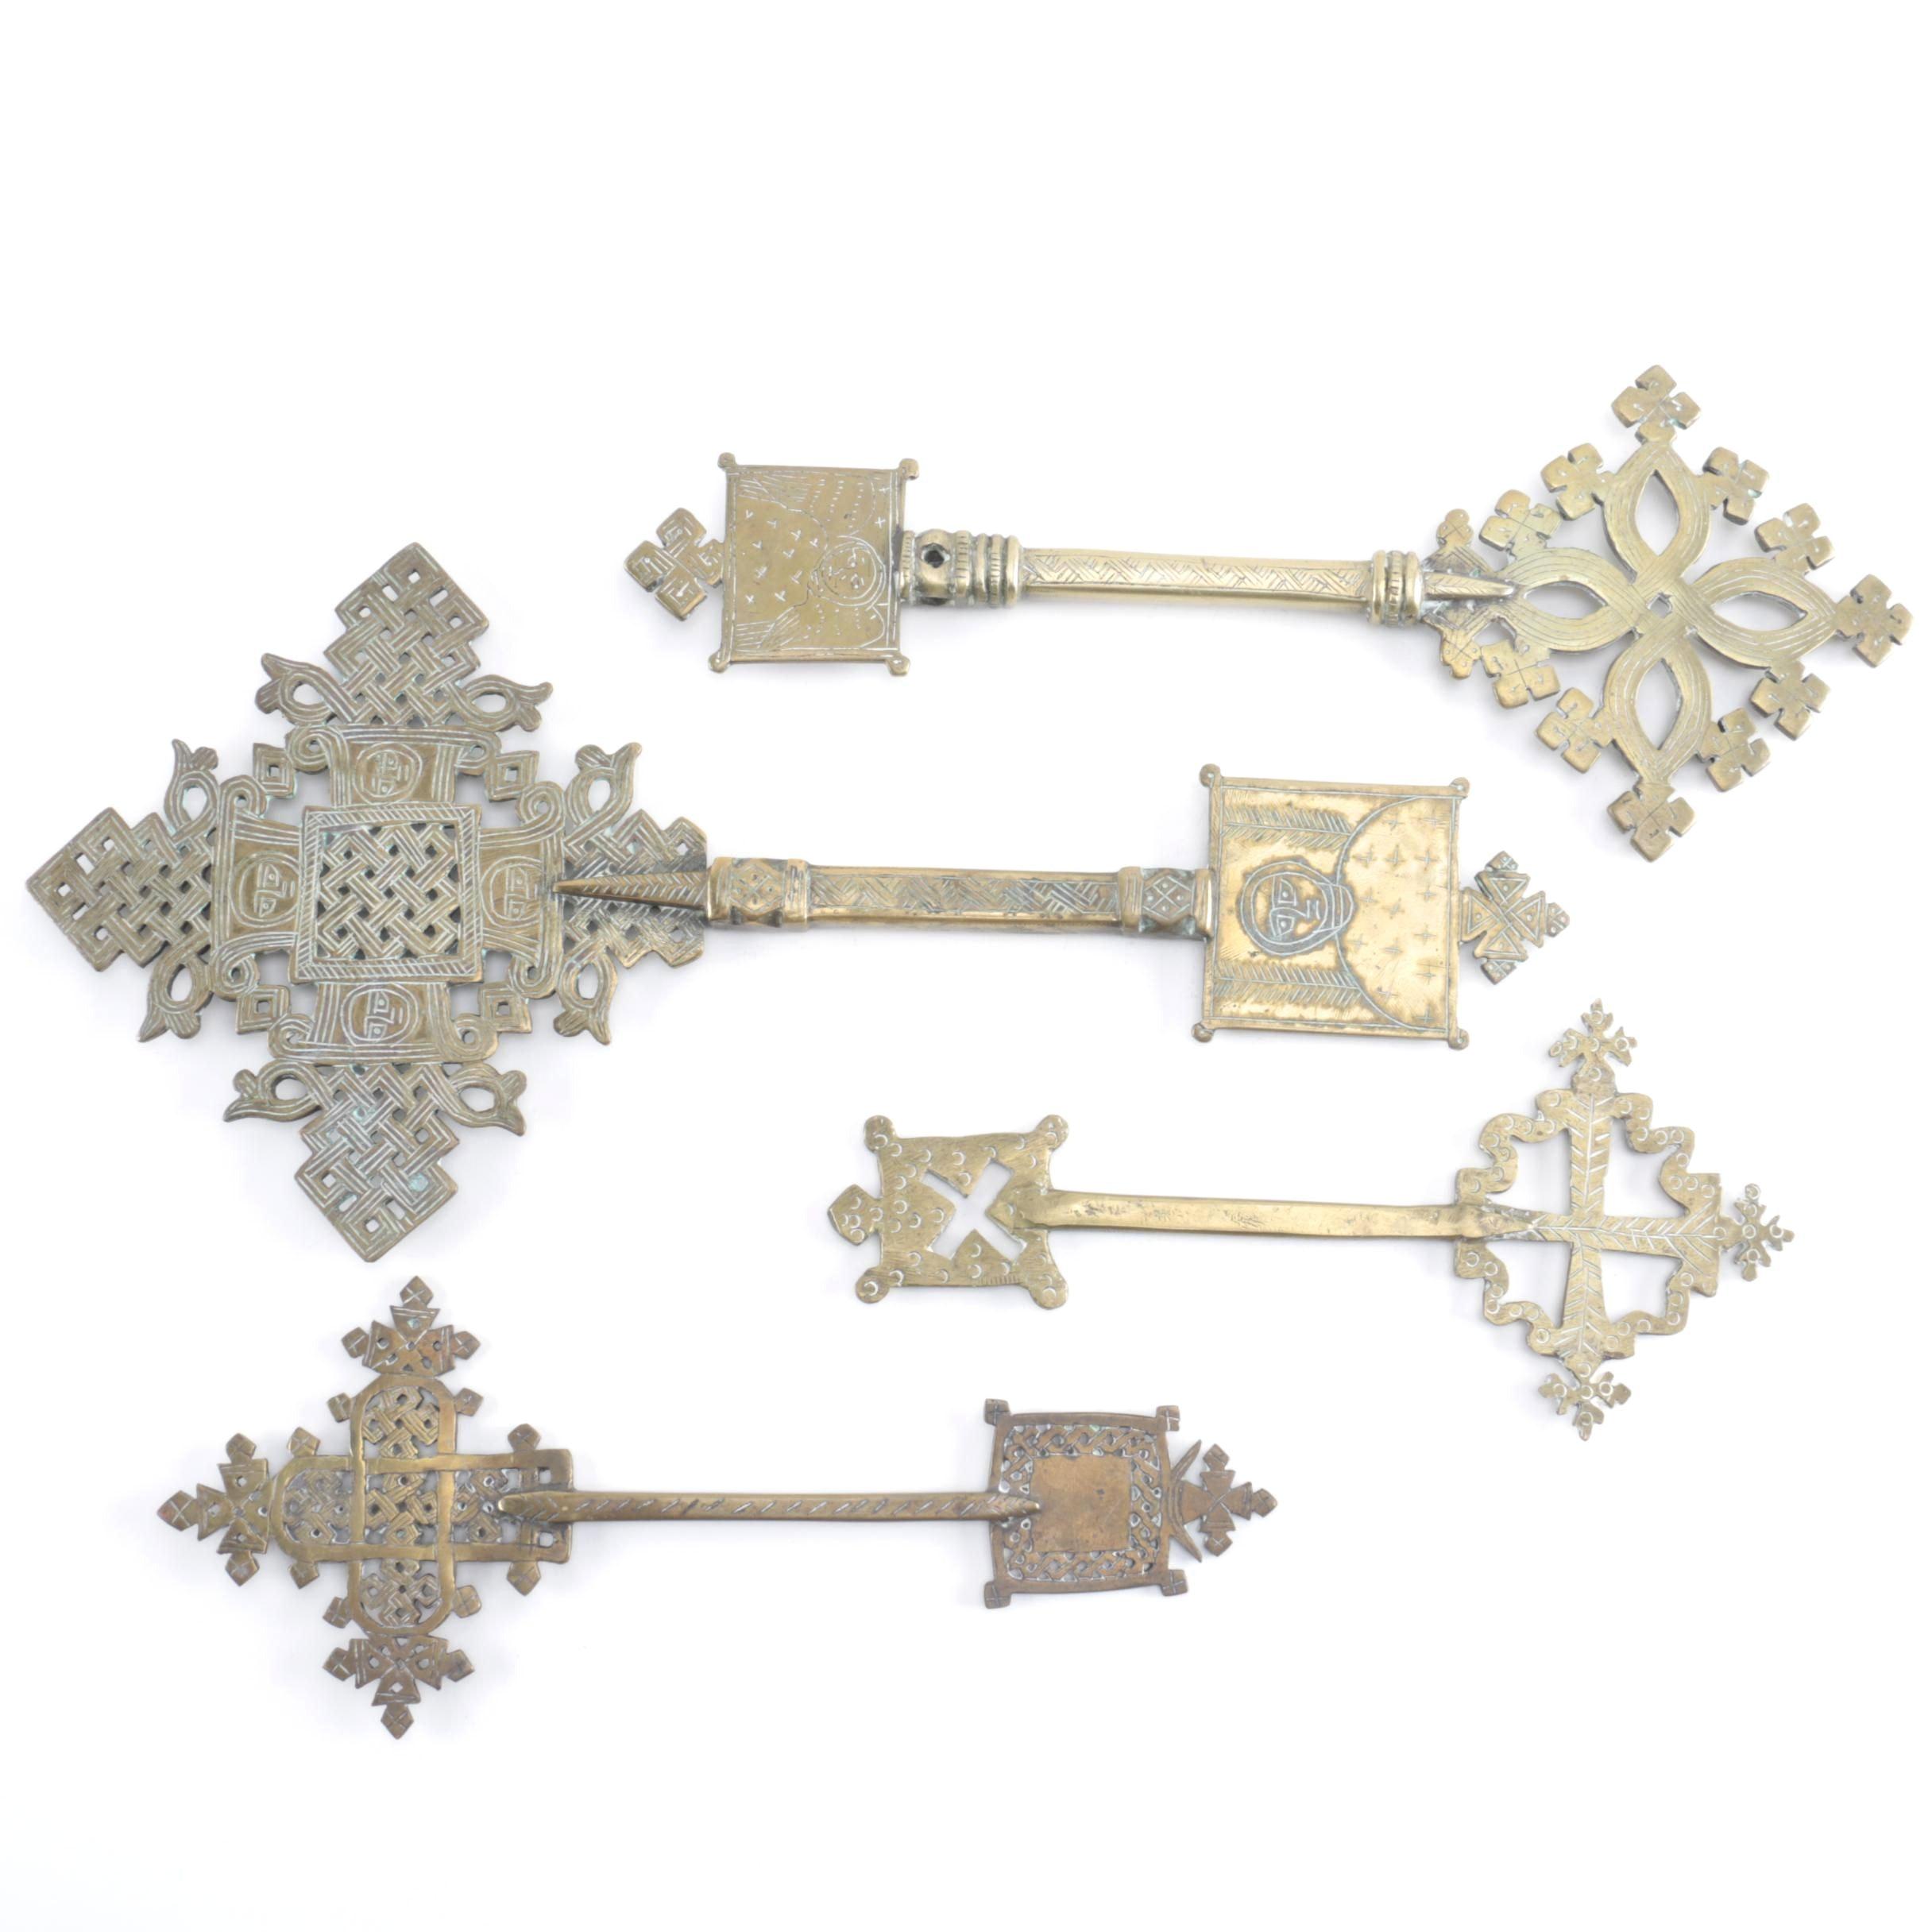 Assortment of Coptic Christian Blessing Crosses